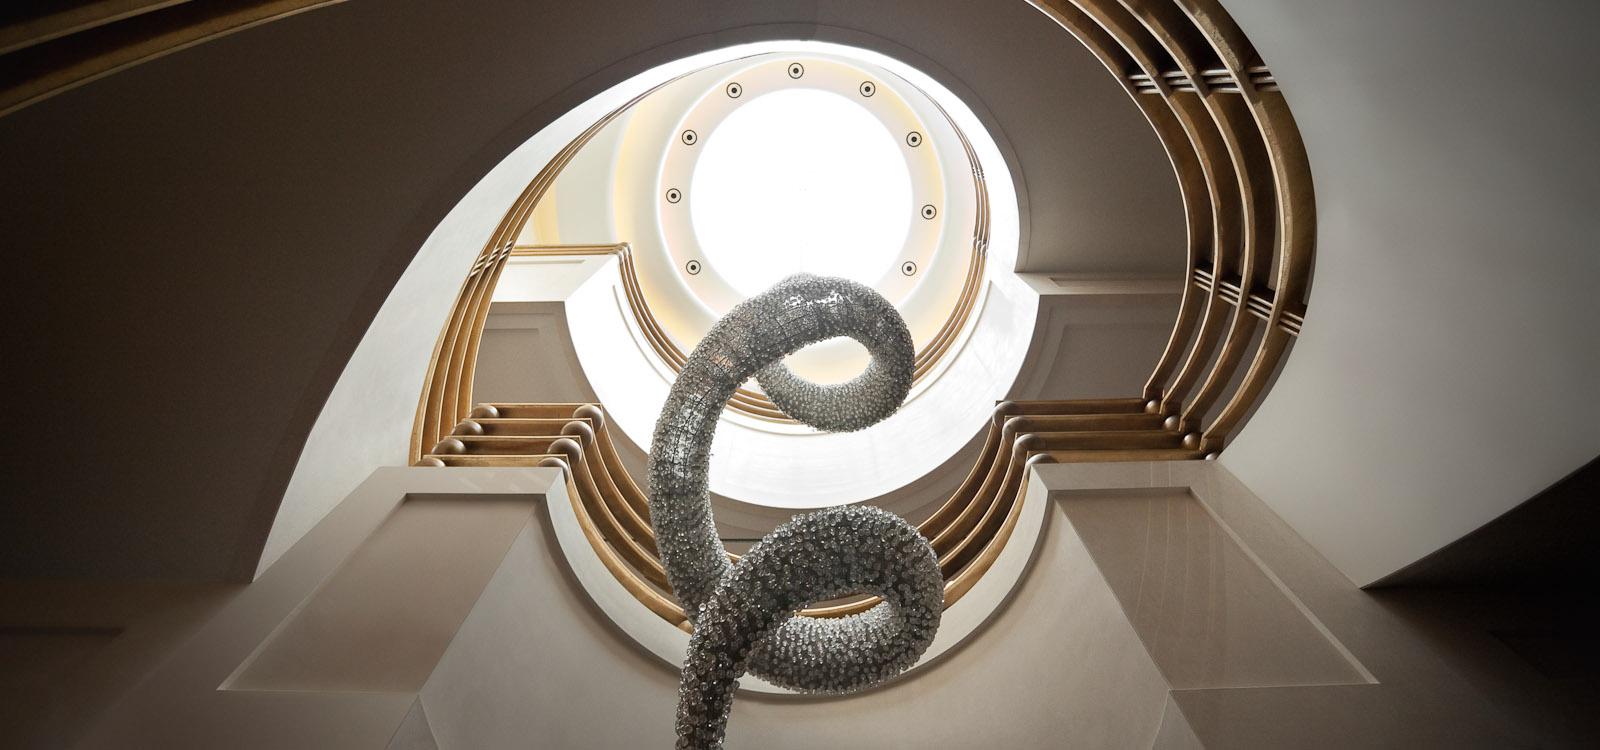 1074-details-ballrm-staircase